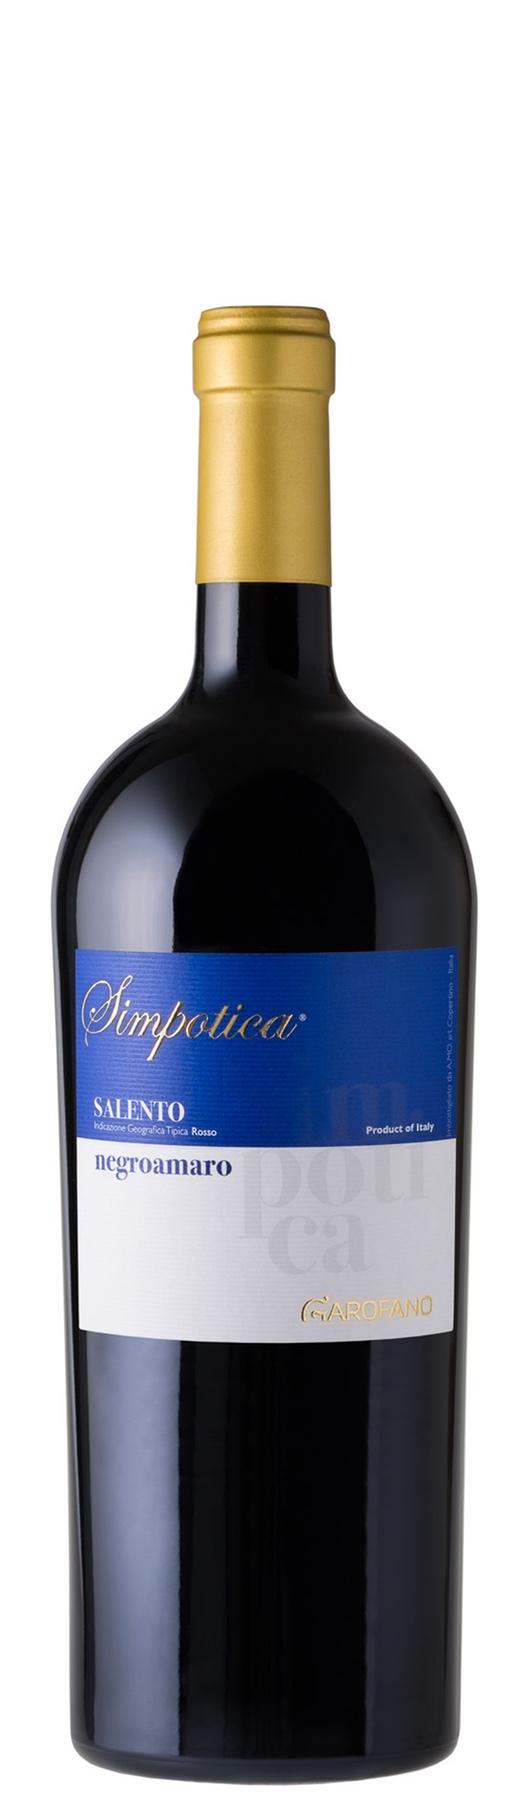 Bottiglia vino Magnum Simpotica